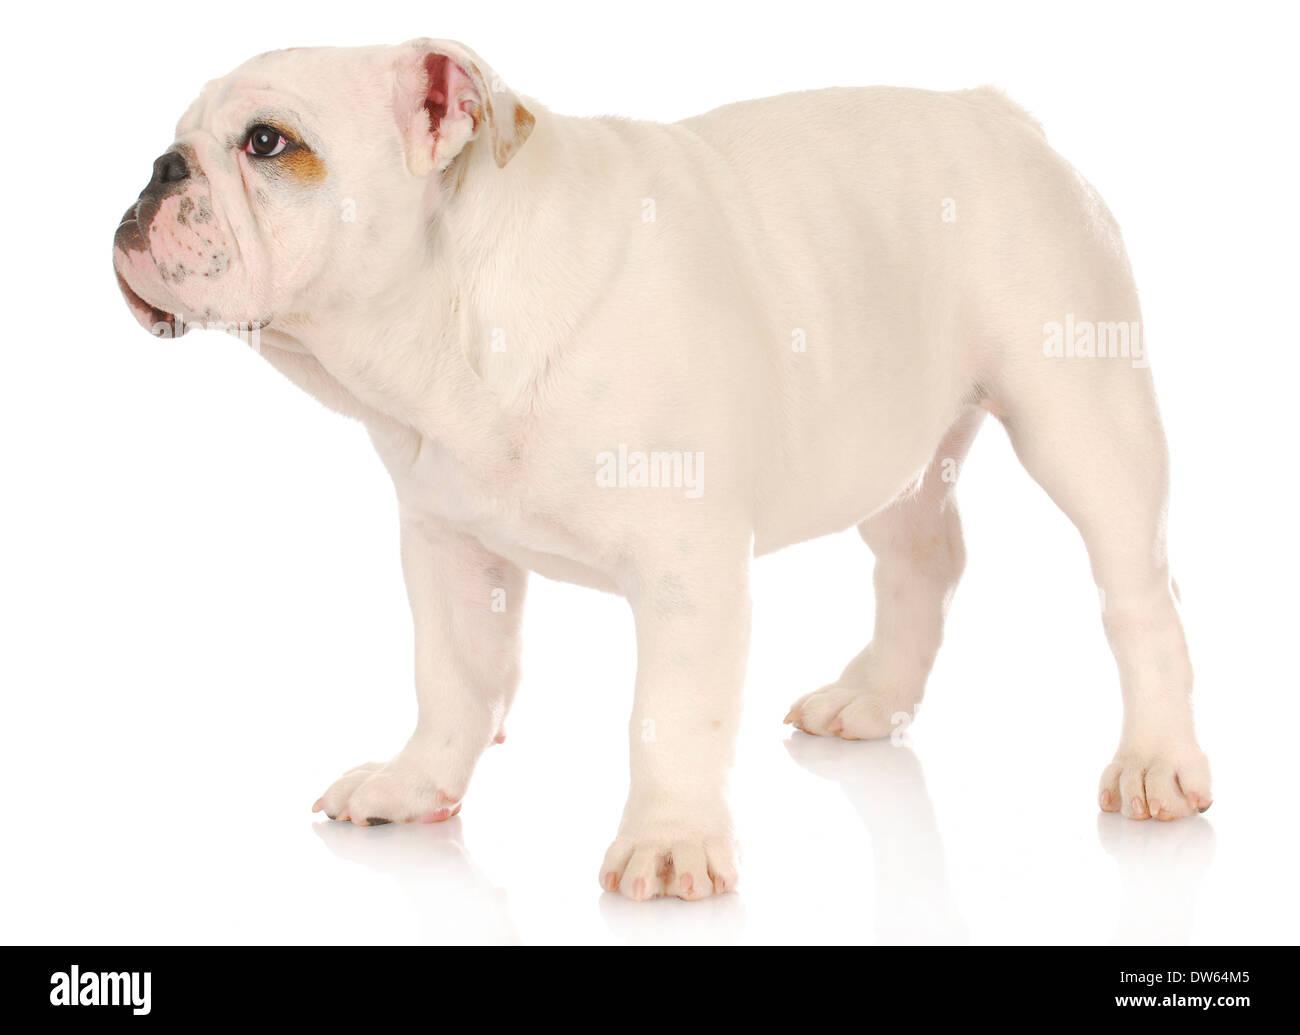 Cute white english bulldog puppies